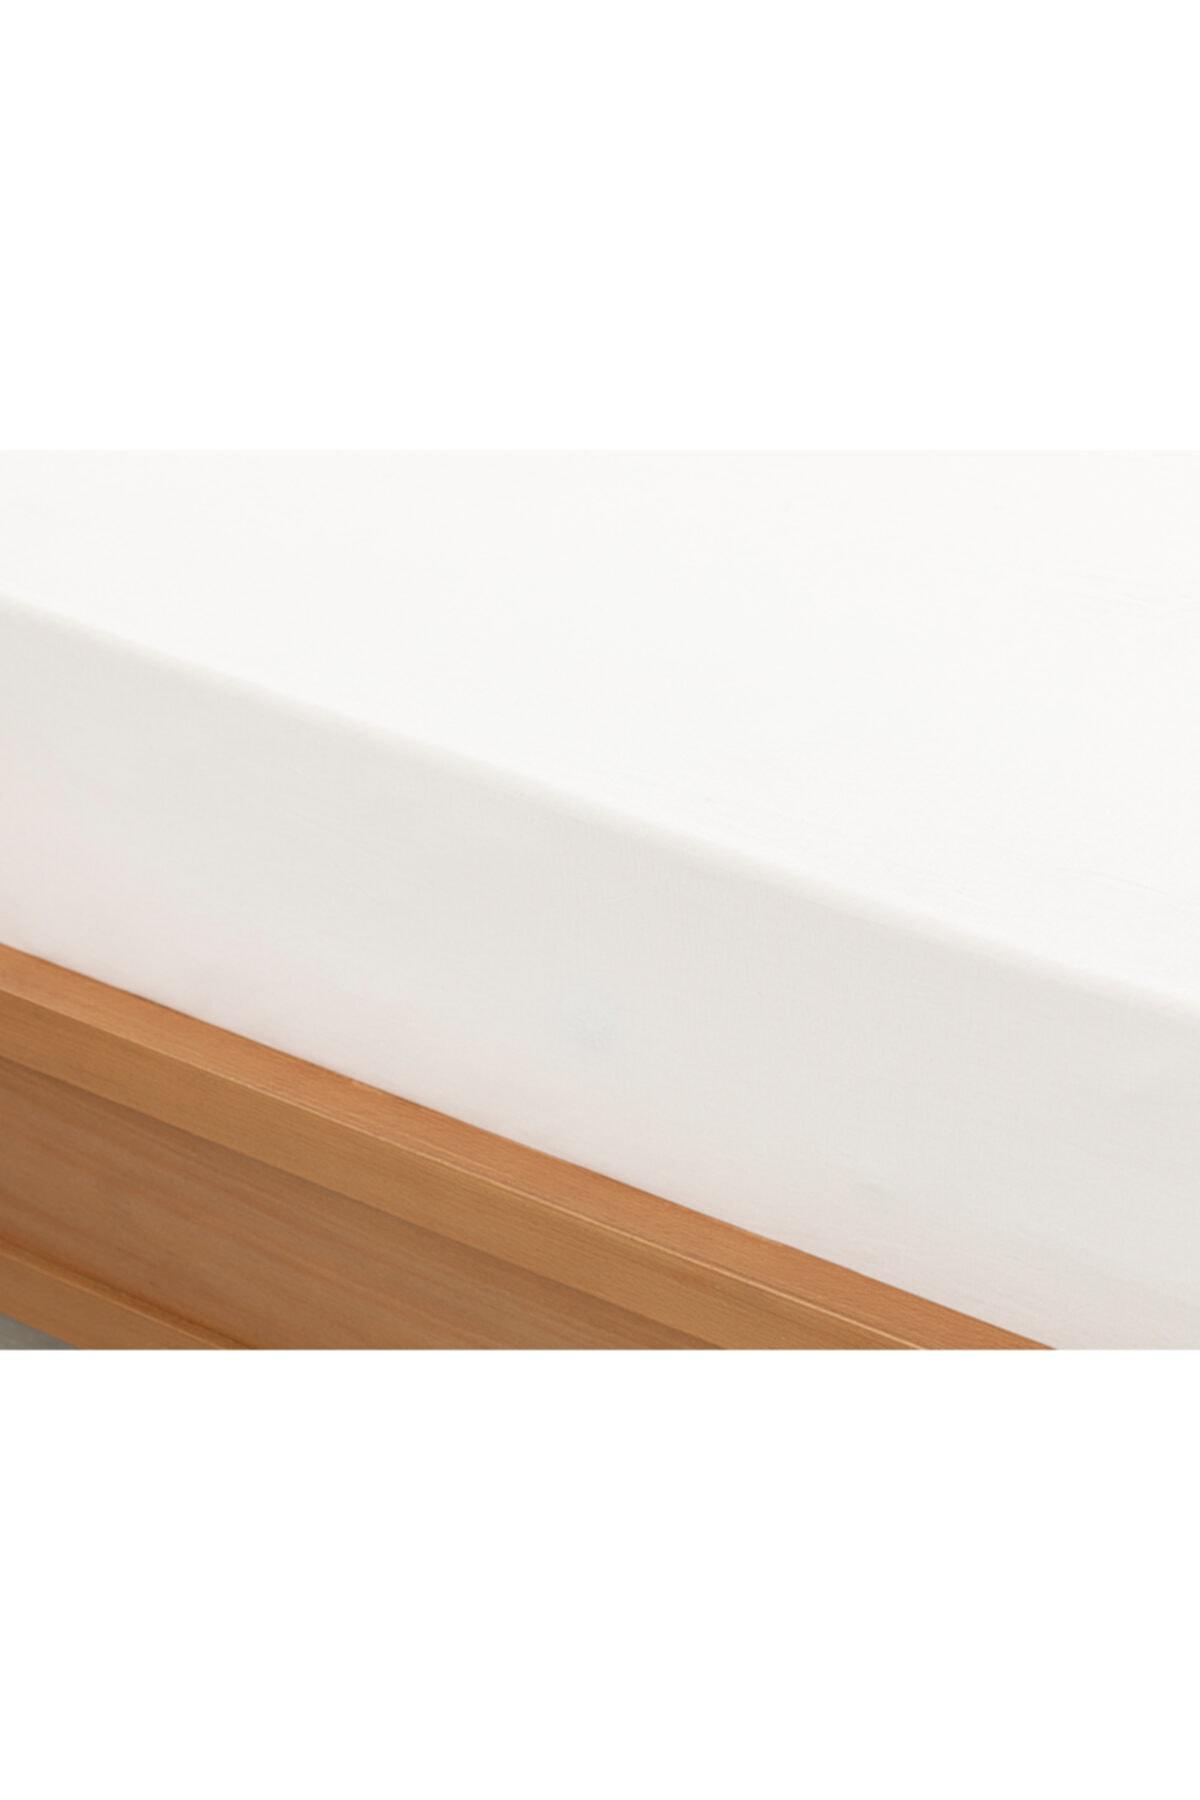 English Home Düz 2 Pamuklu Çift Kişilik Lastikli Çarşaf 160X200 Cm Beyaz 2